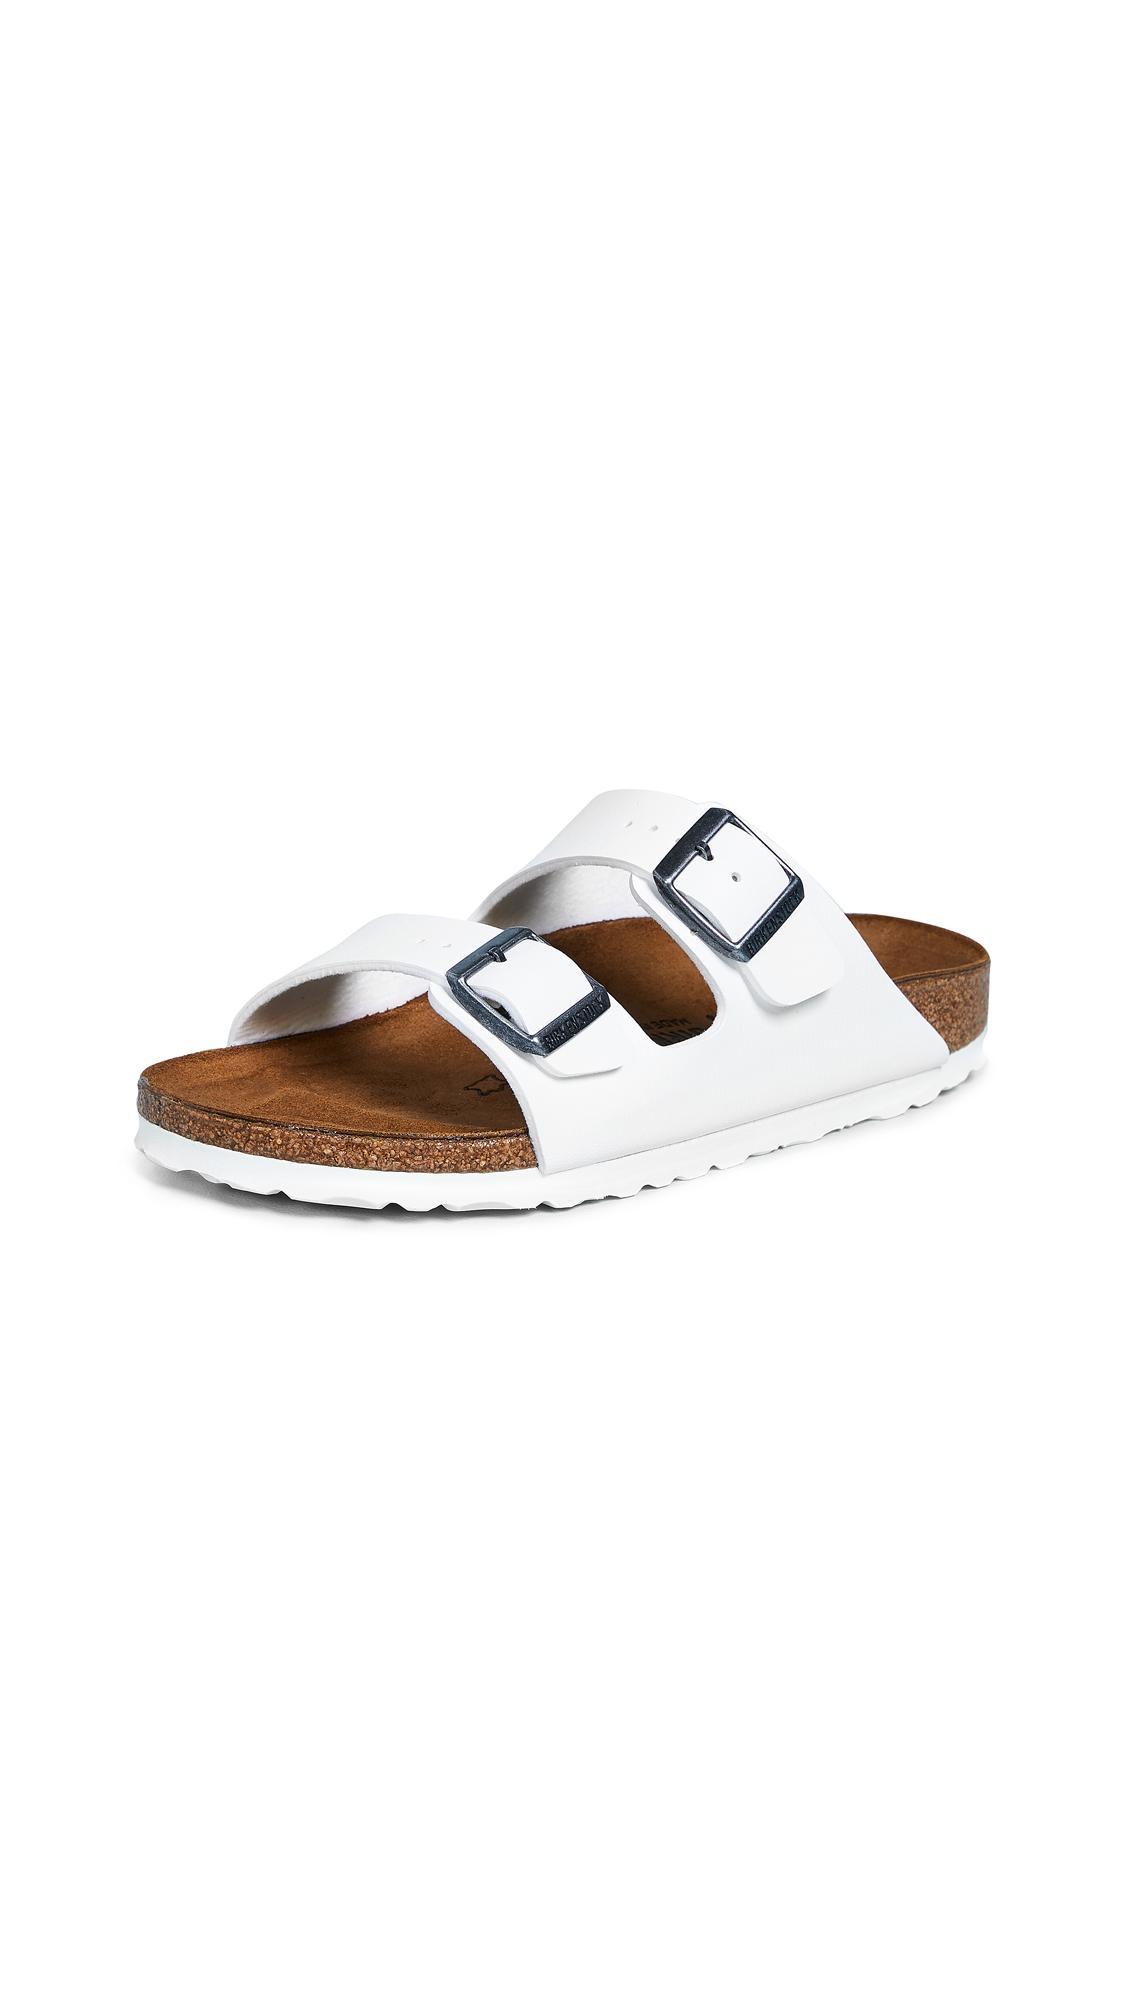 60ab7224b79df Birkenstock Arizona Narrow Fit Shiny Snake Cream Flat Sandals - Cream In  White White